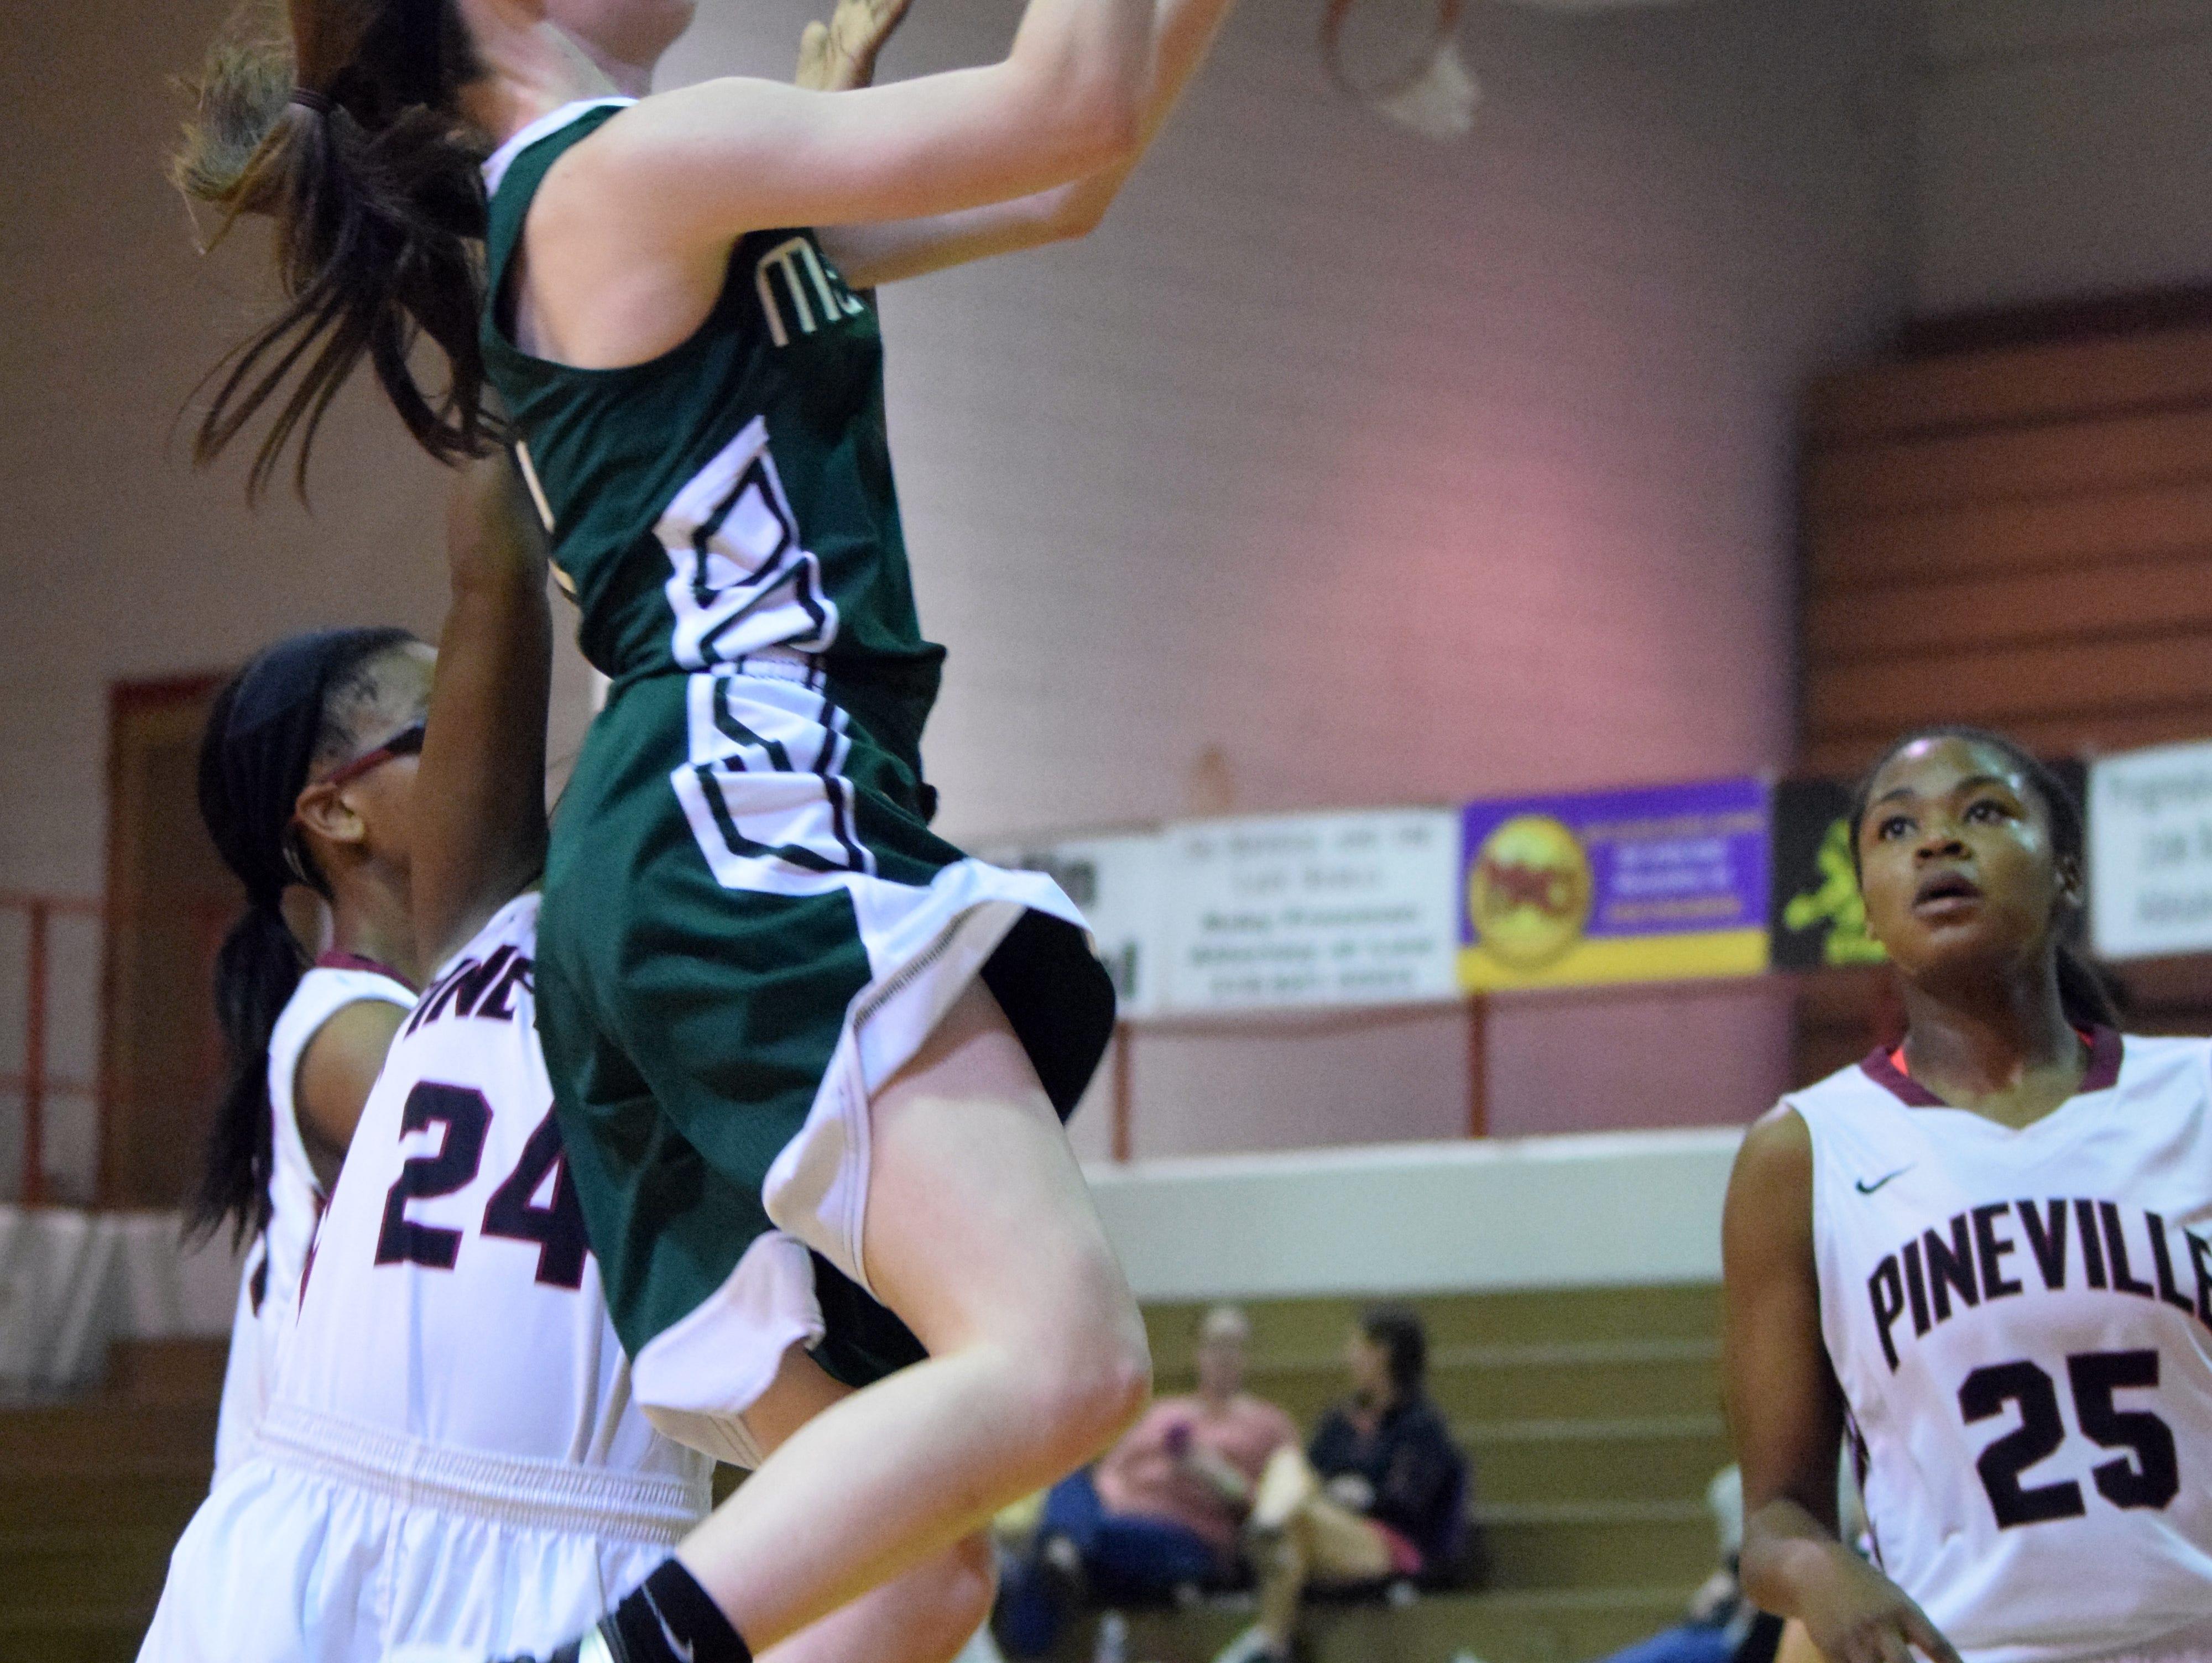 Menard's Maddie Smith (4) shoots against Pineville Wednesday at Pineville High School.